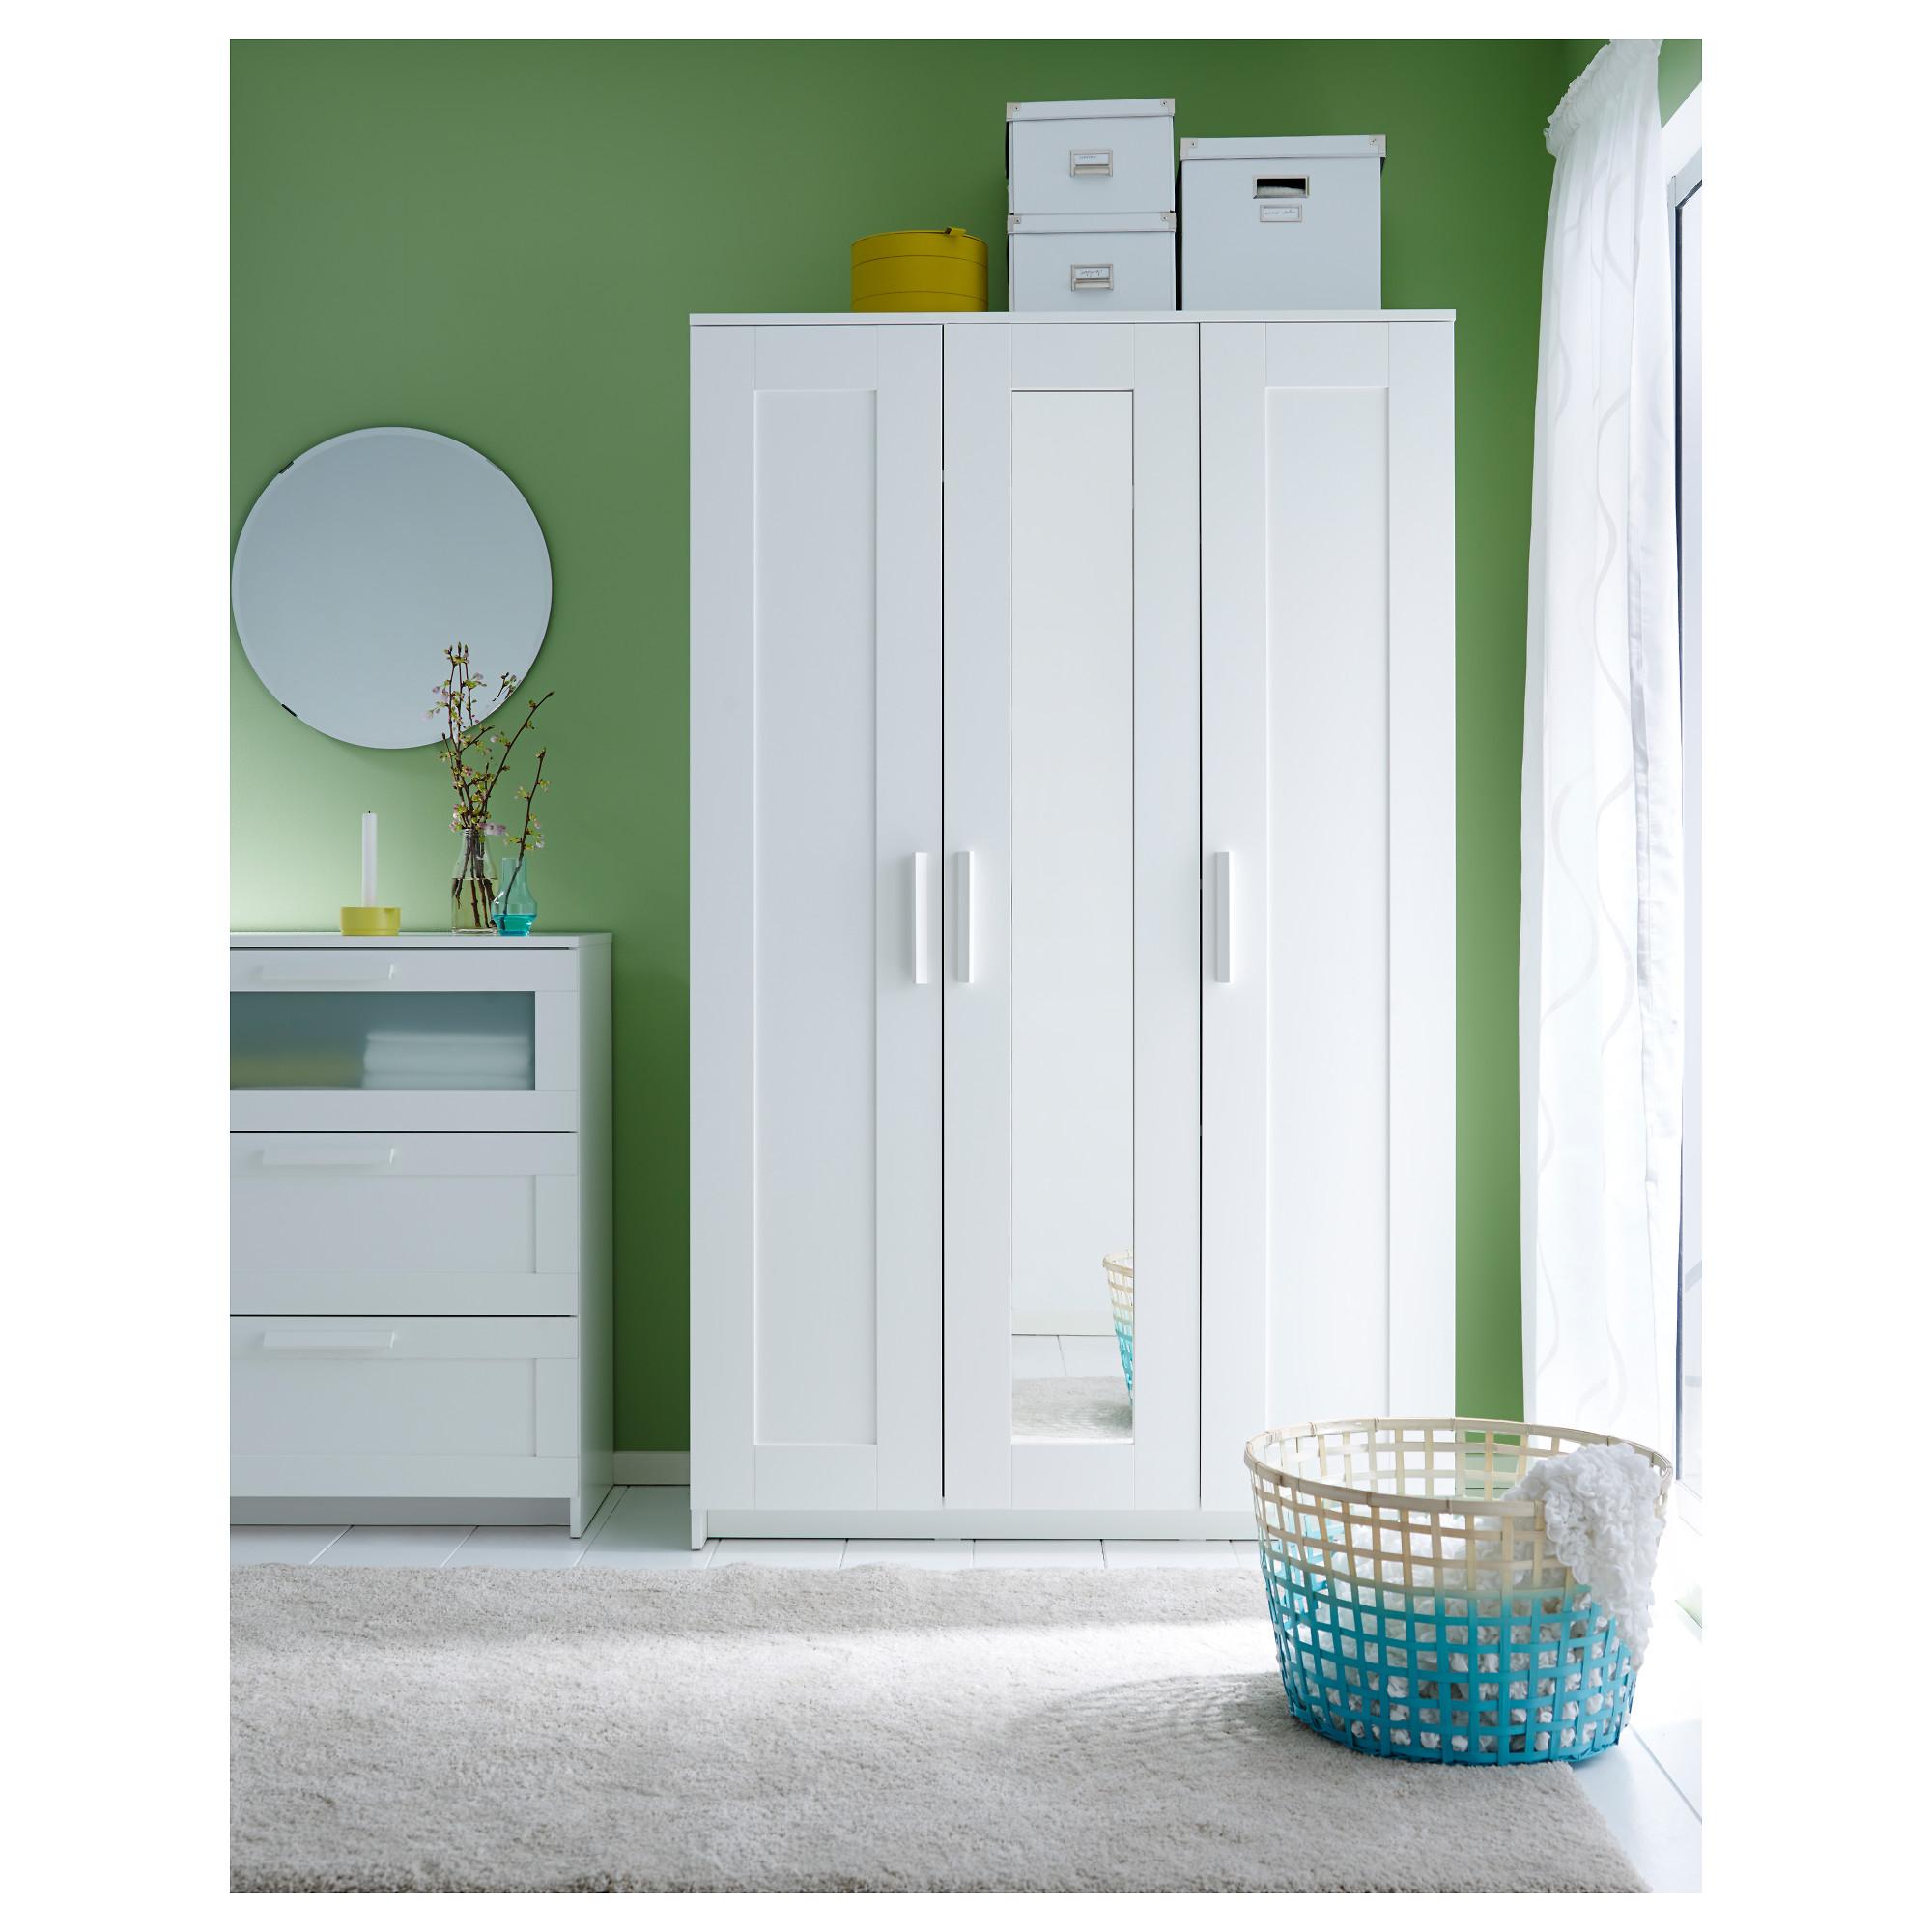 Hasil gambar untuk 3 doors cupboard